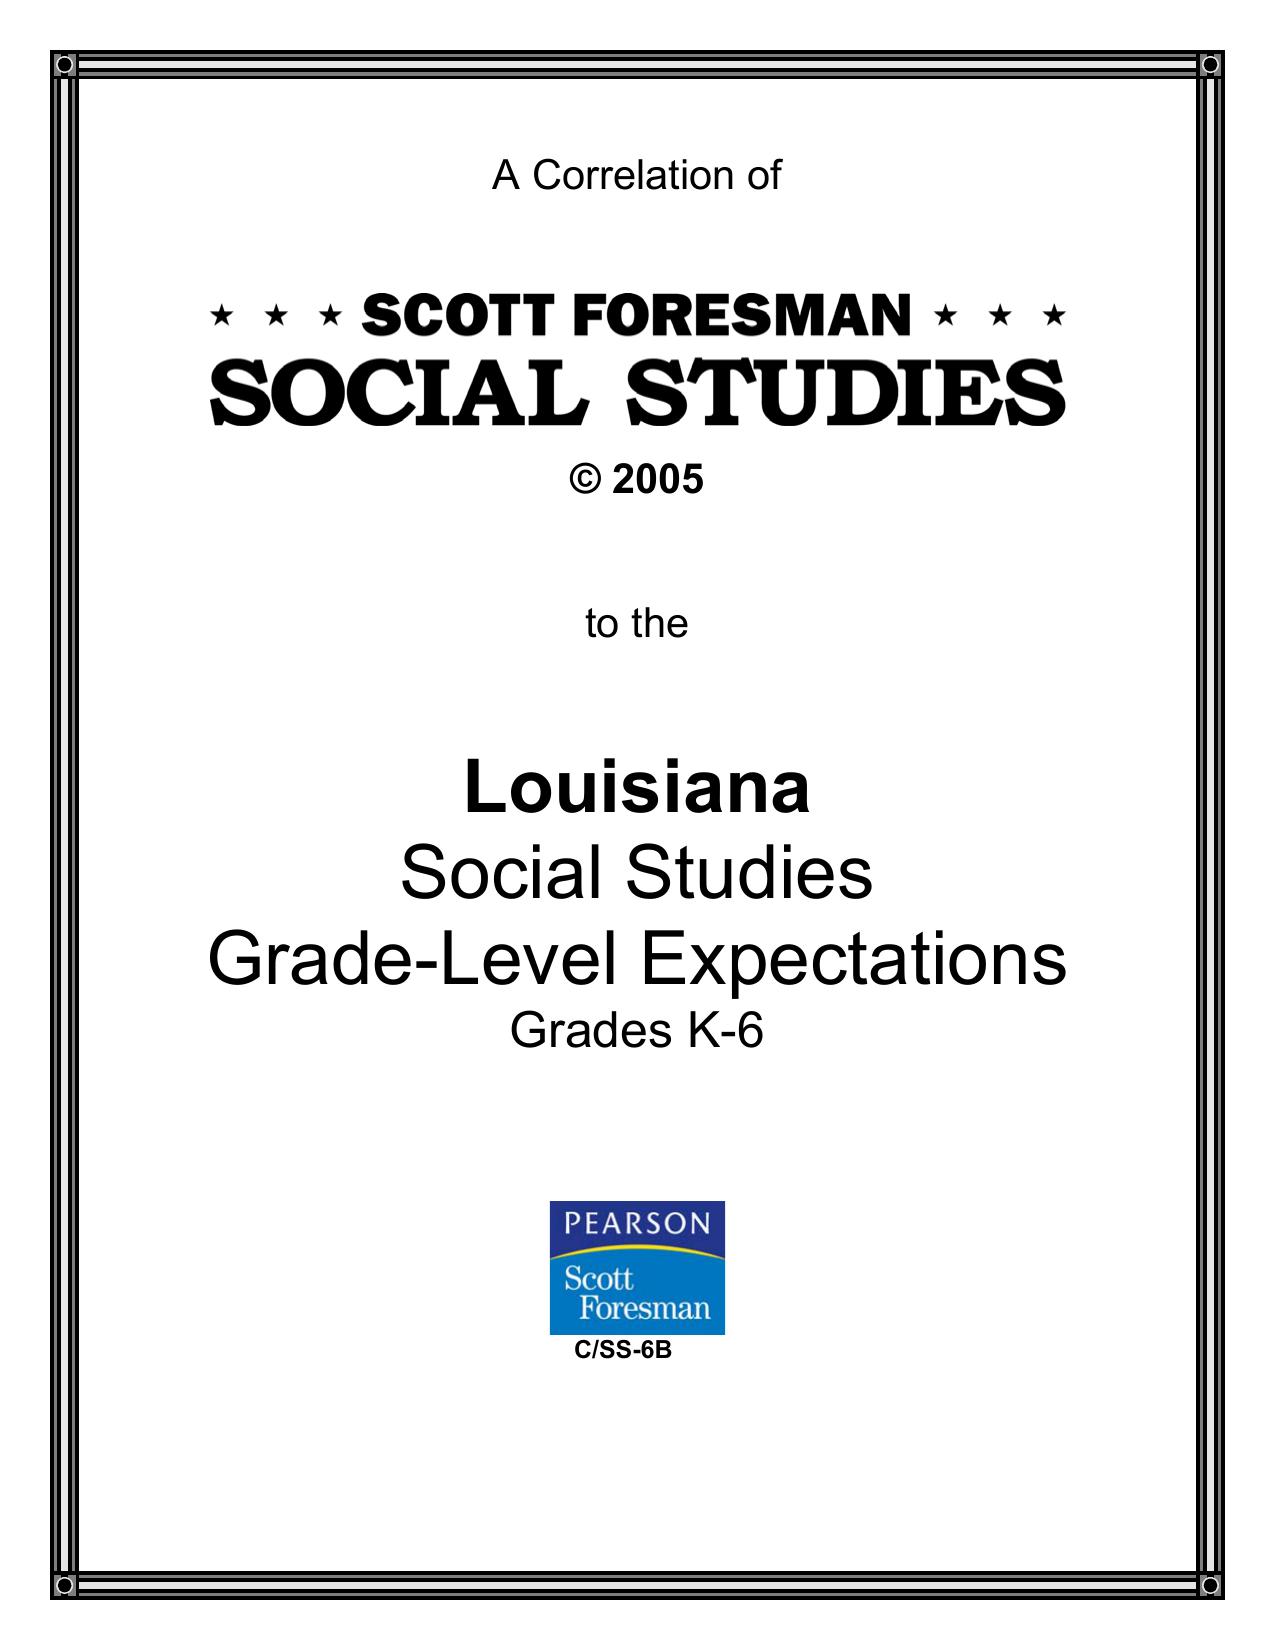 SCOTT FORESMAN SOCIAL STUDIES, copyright